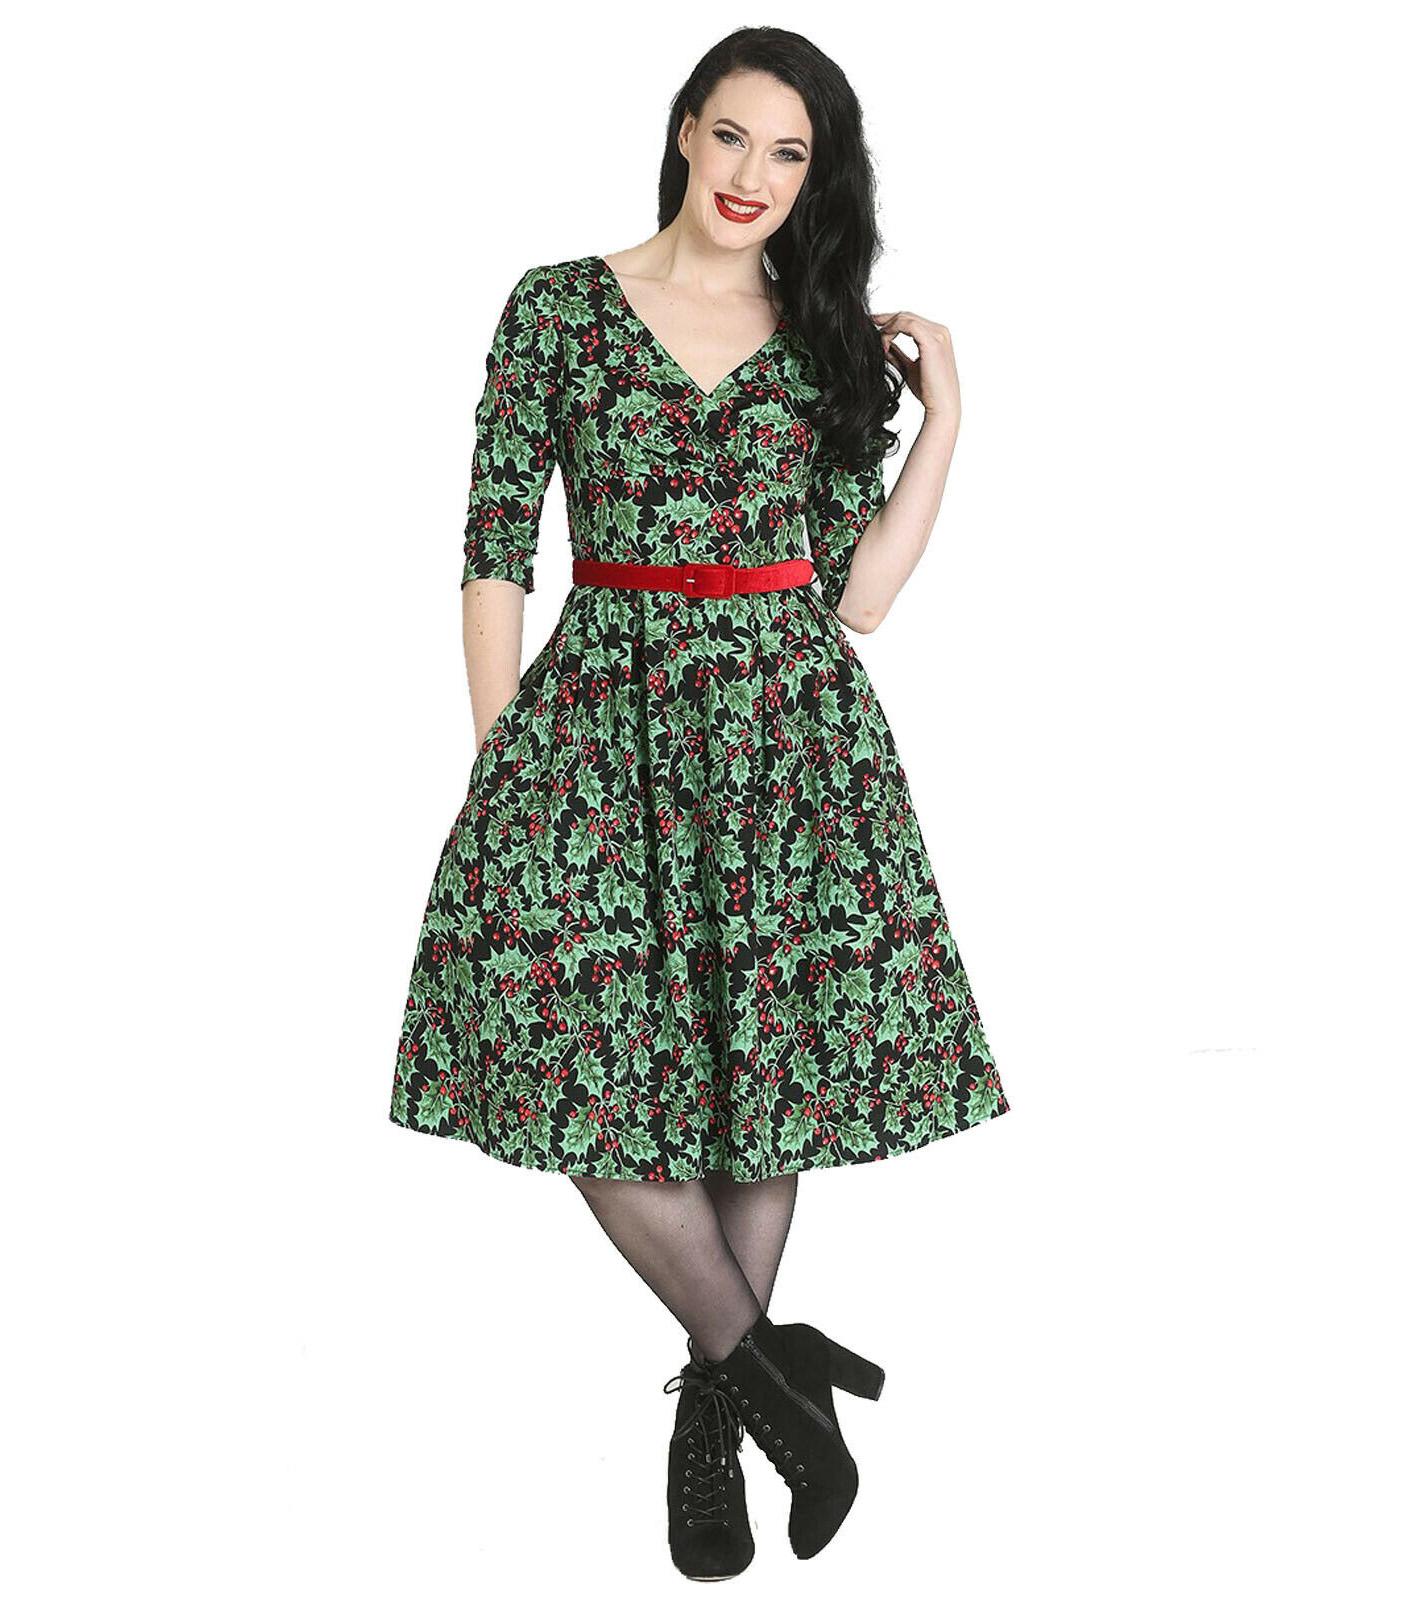 Hell-Bunny-50s-Pin-Up-Navidad-Vestido-Festivo-Rojo-Holly-Berry-Negro-Todos-los-Tamanos miniatura 3